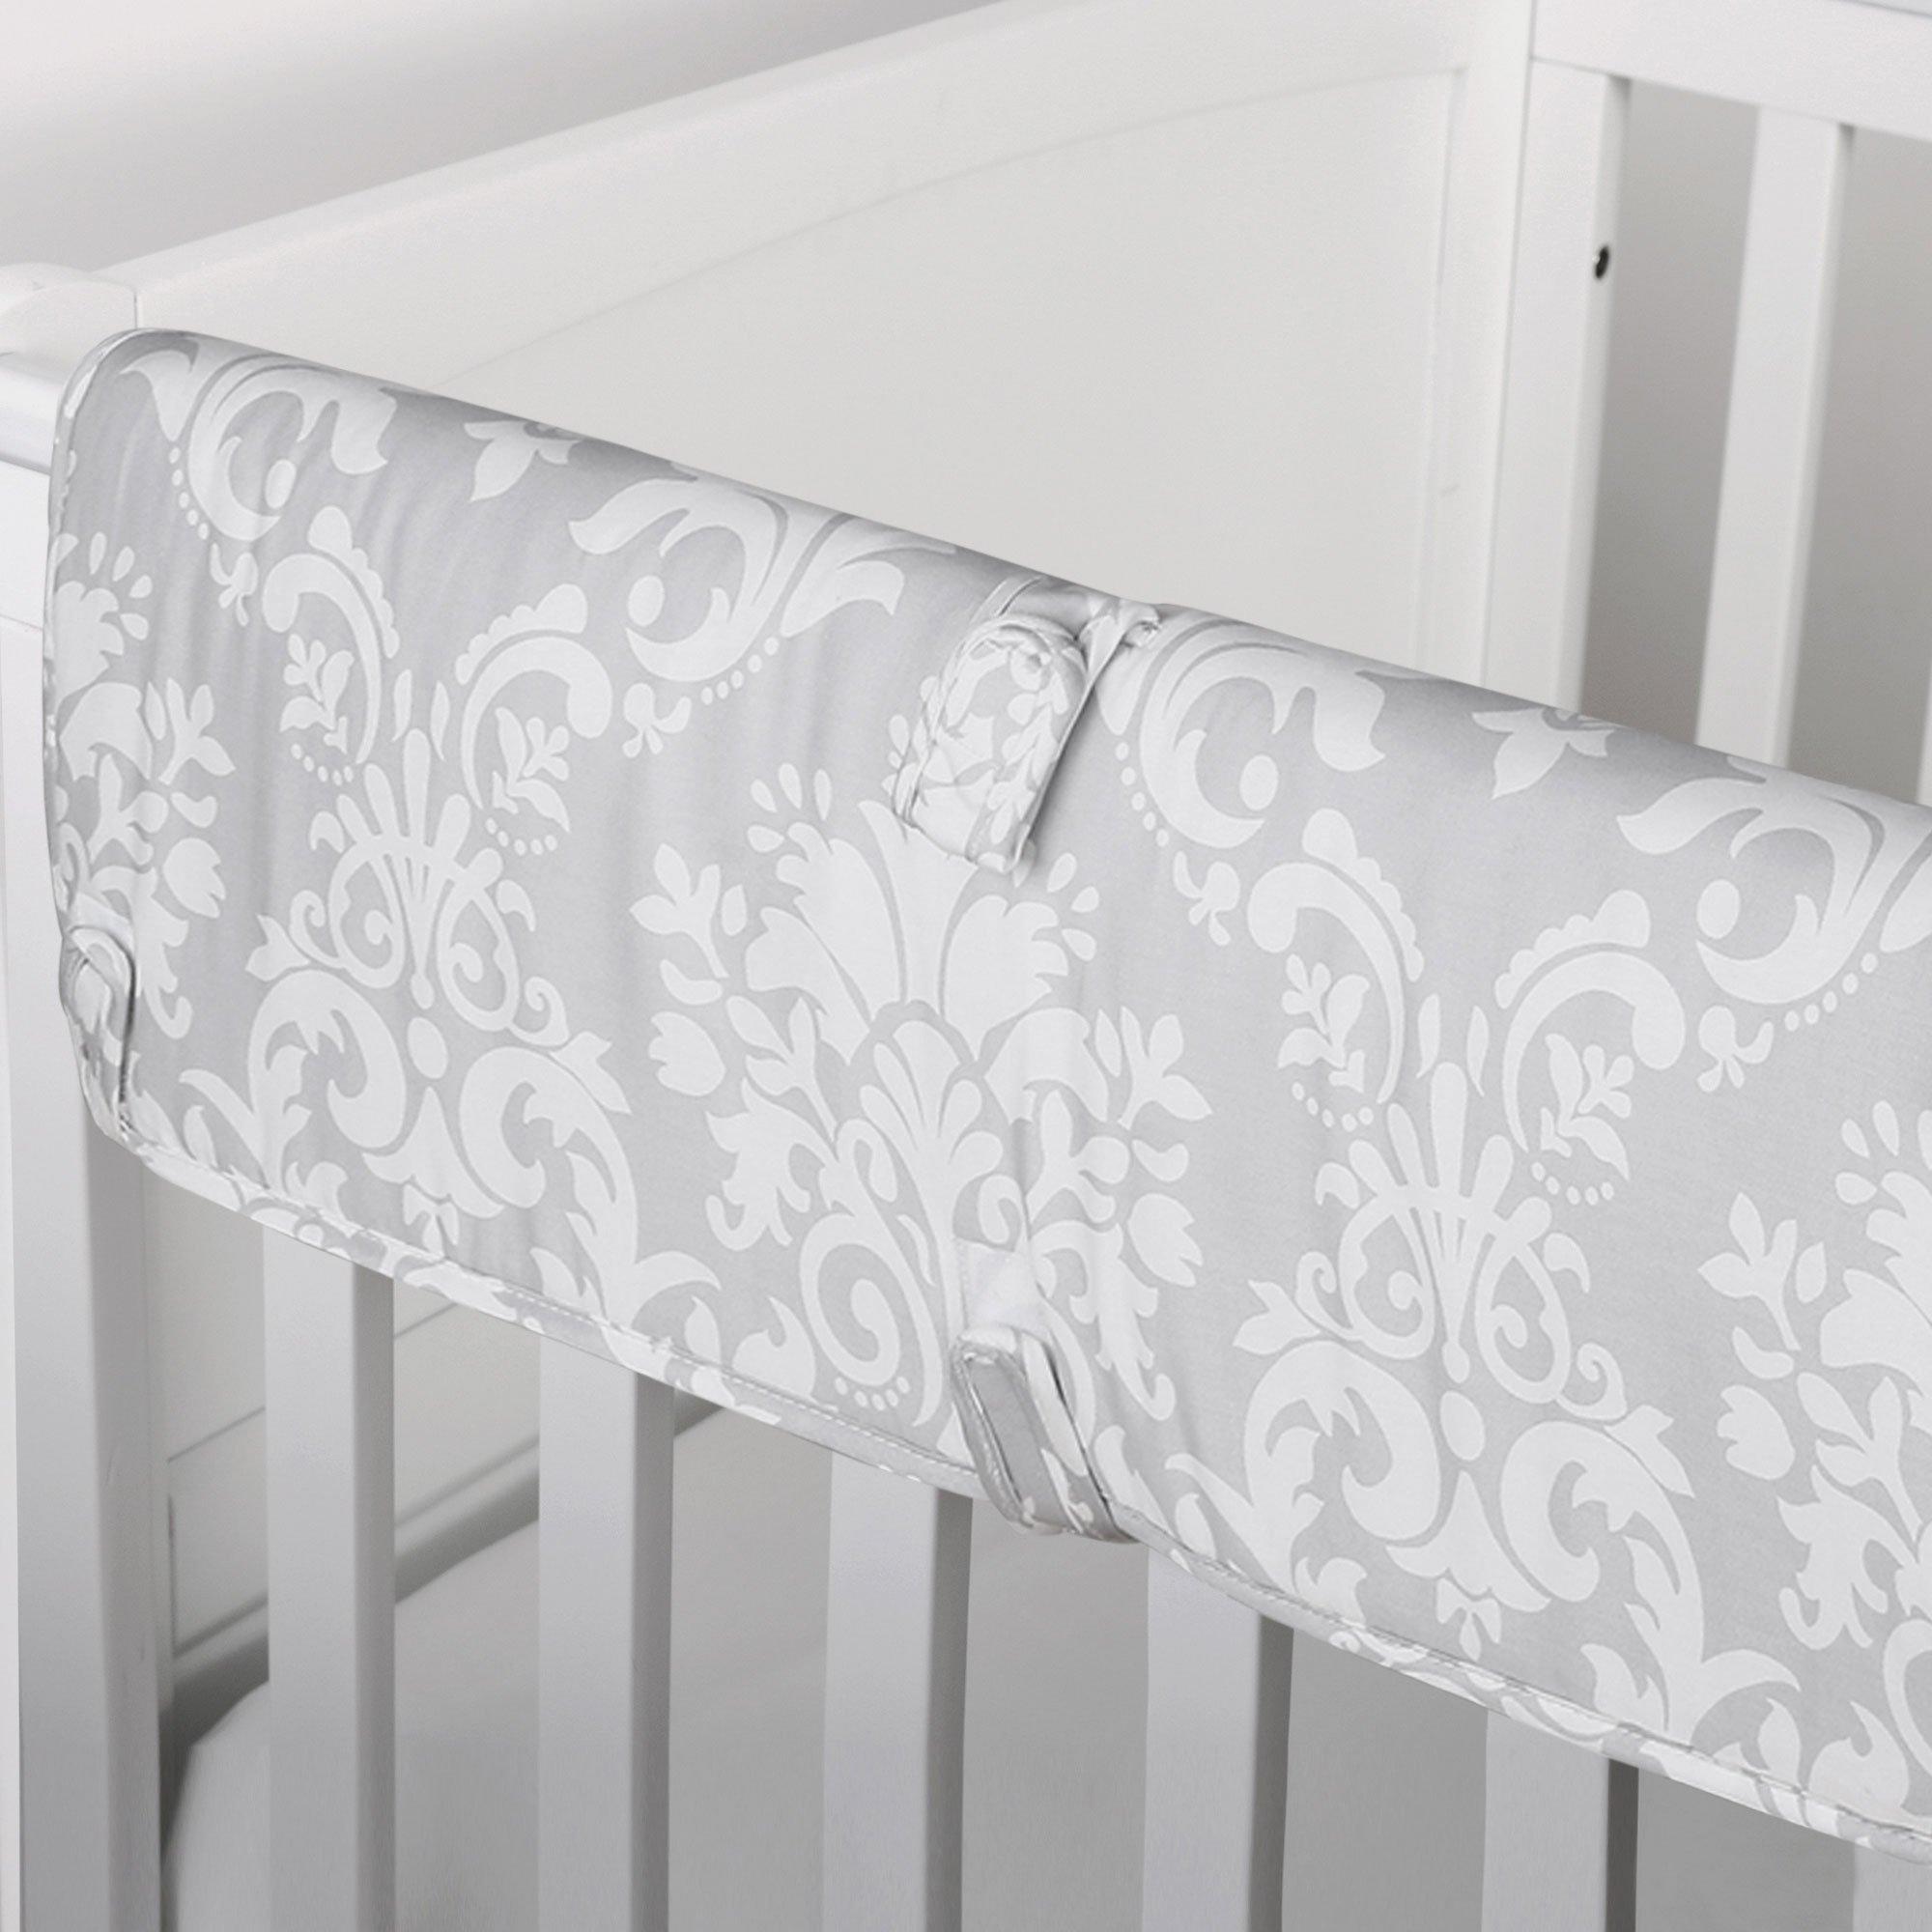 Grey Damask Print 100% Cotton Padded Crib Rail Guard by The Peanut Shell